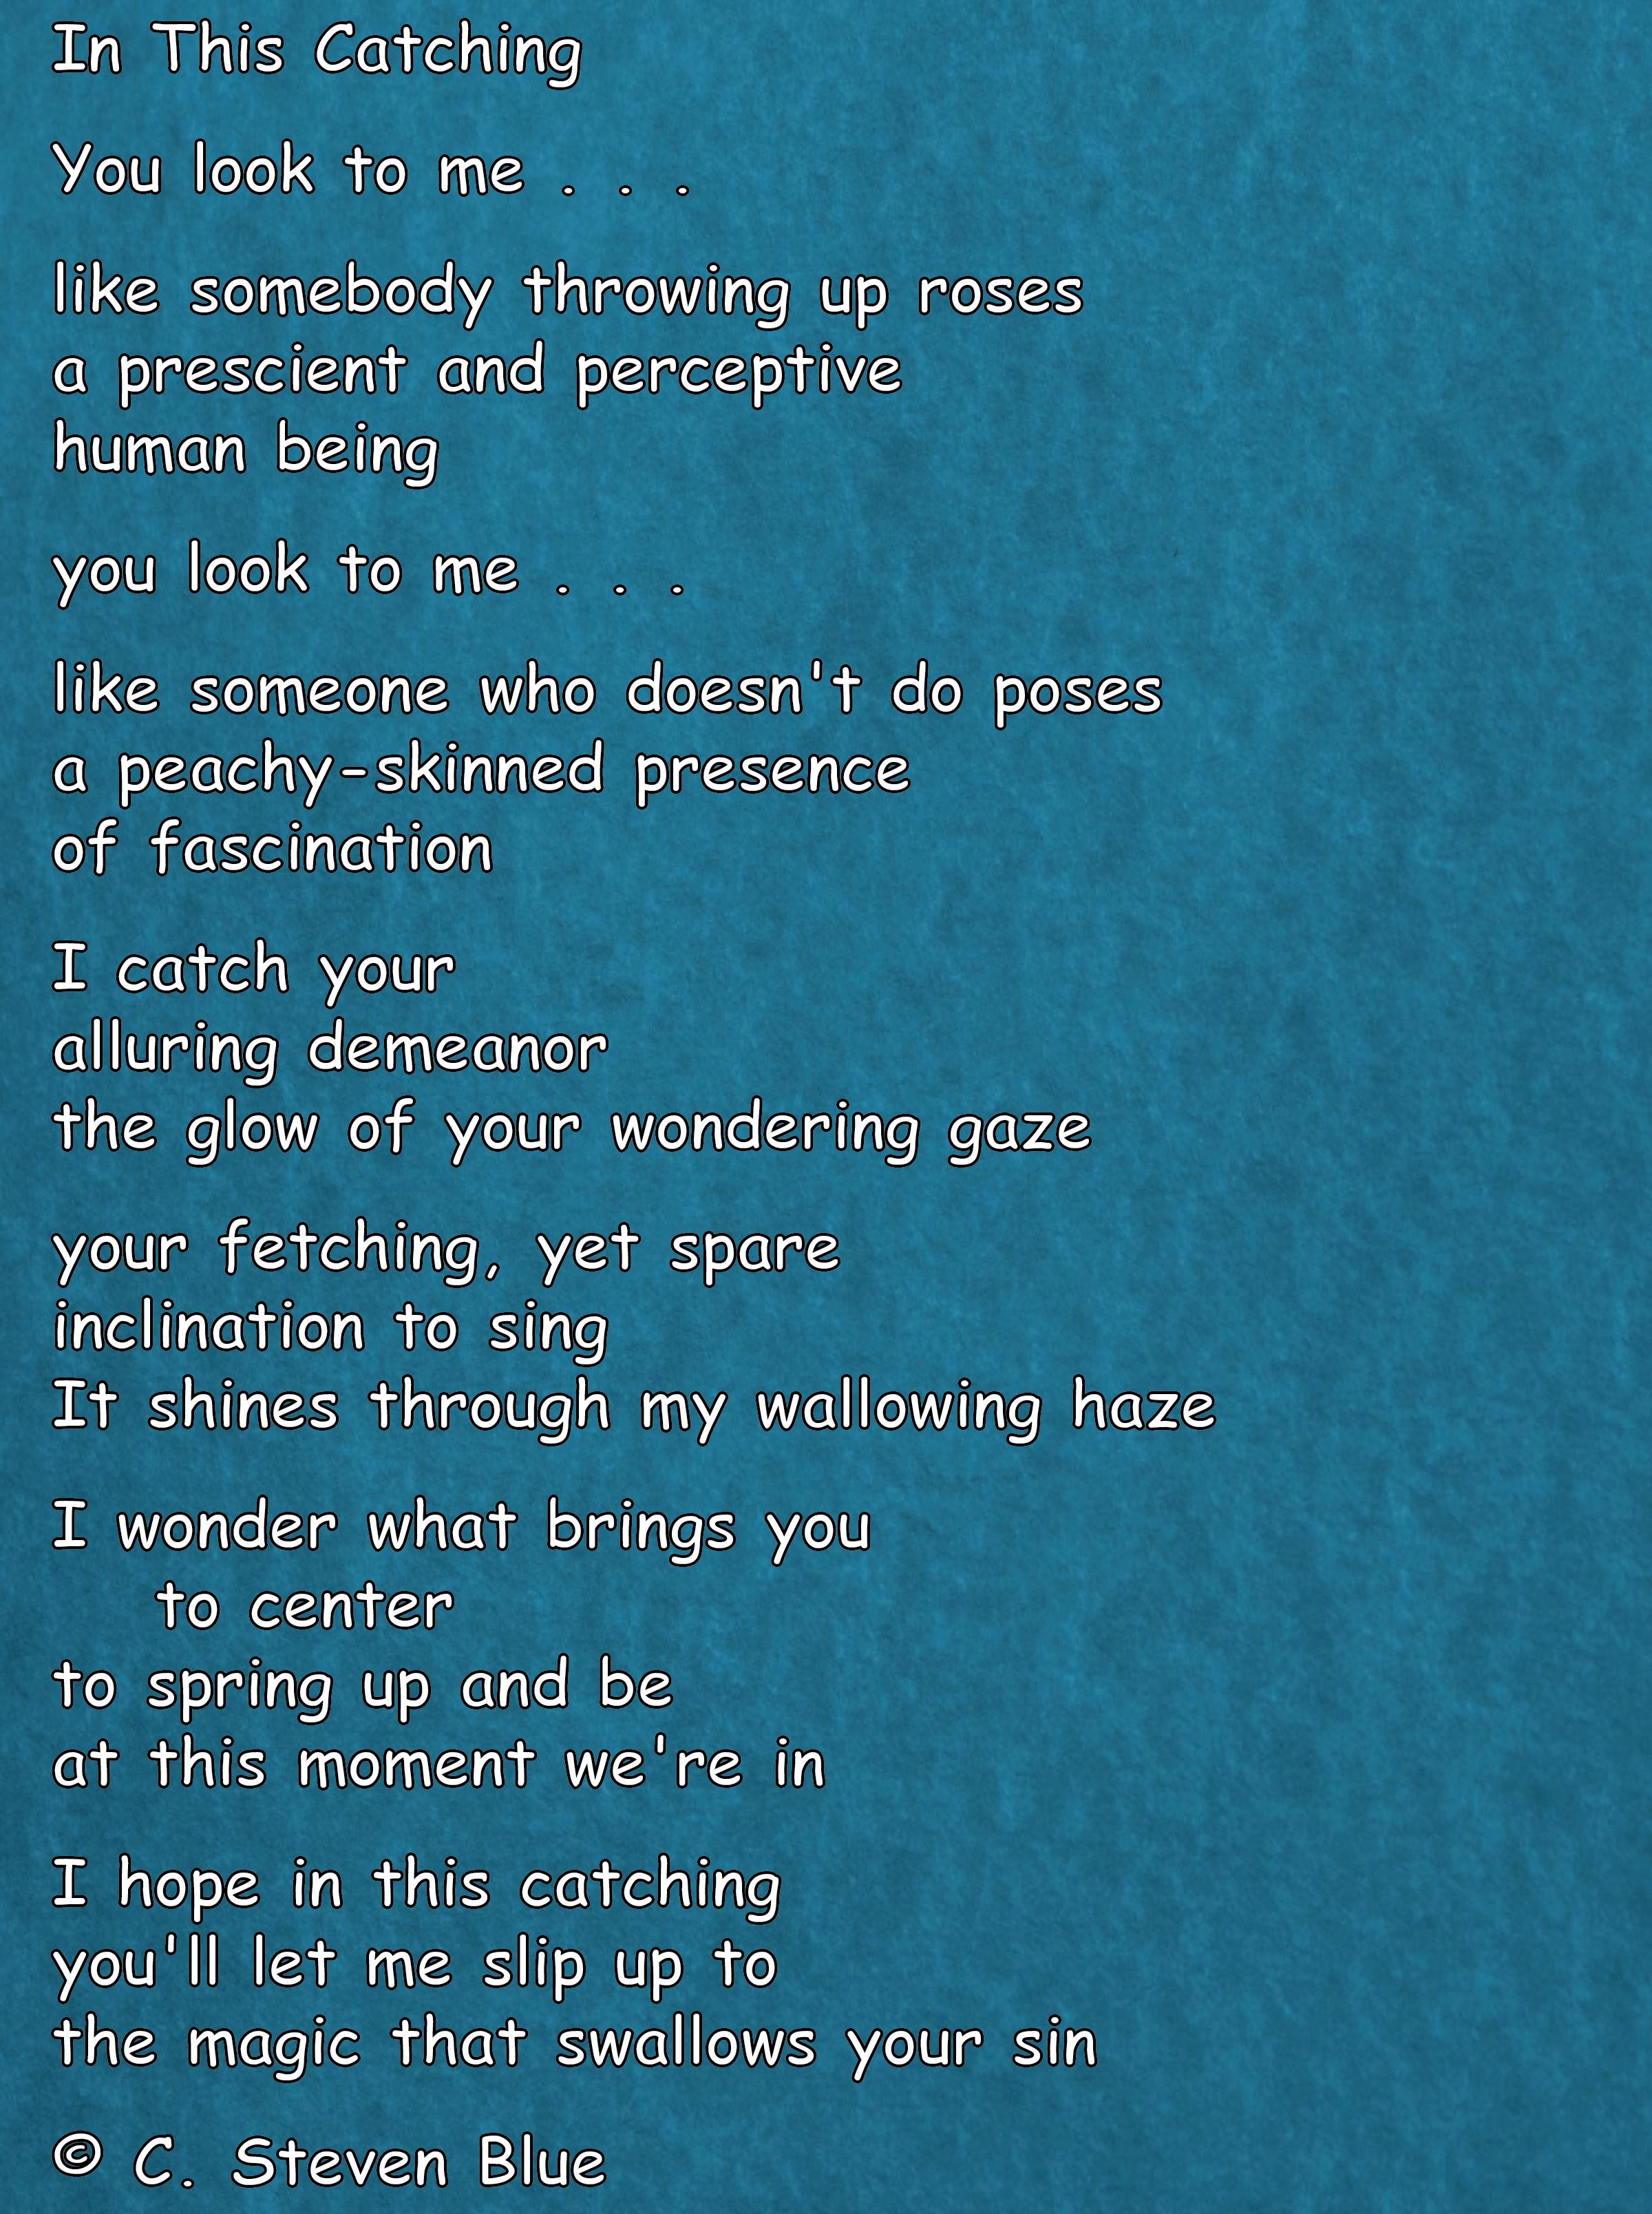 a brand new poem